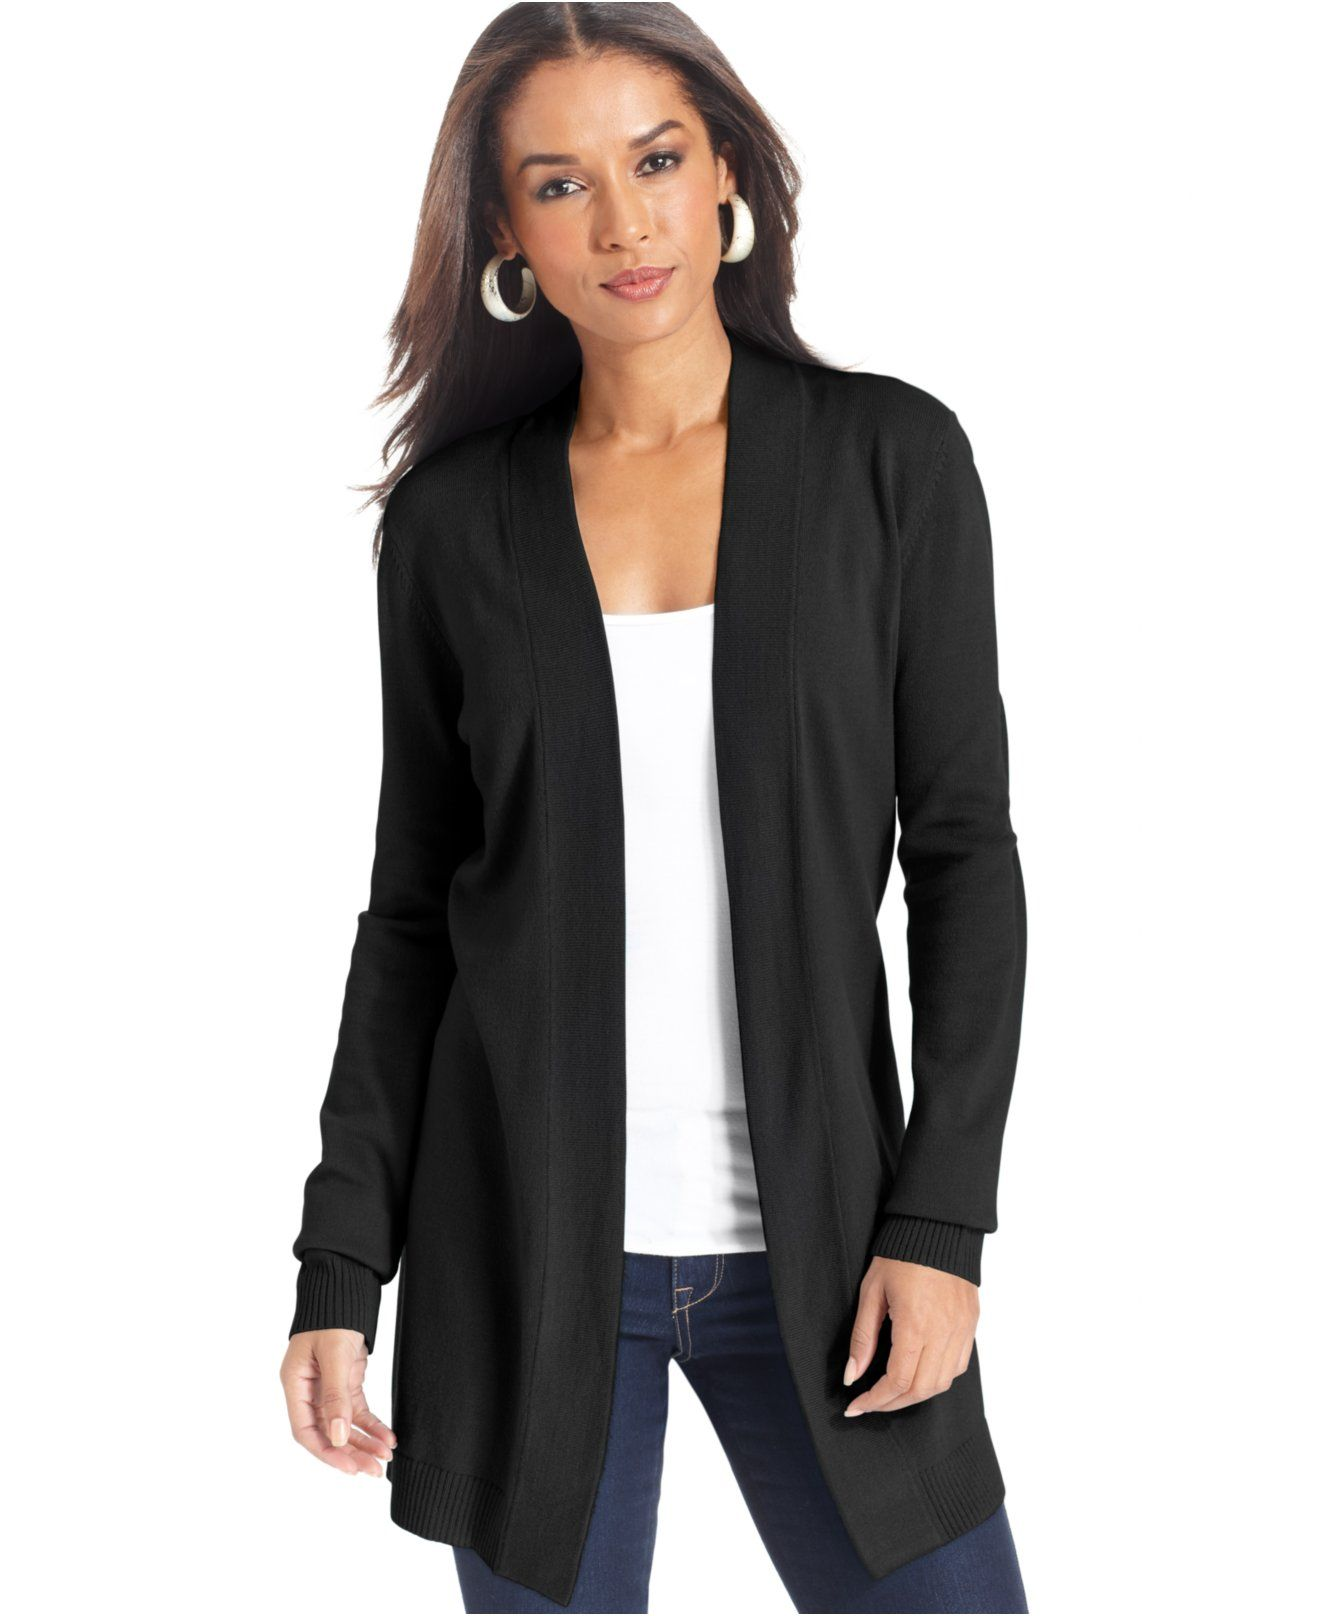 Down xsmall sale macys womens sweaters size